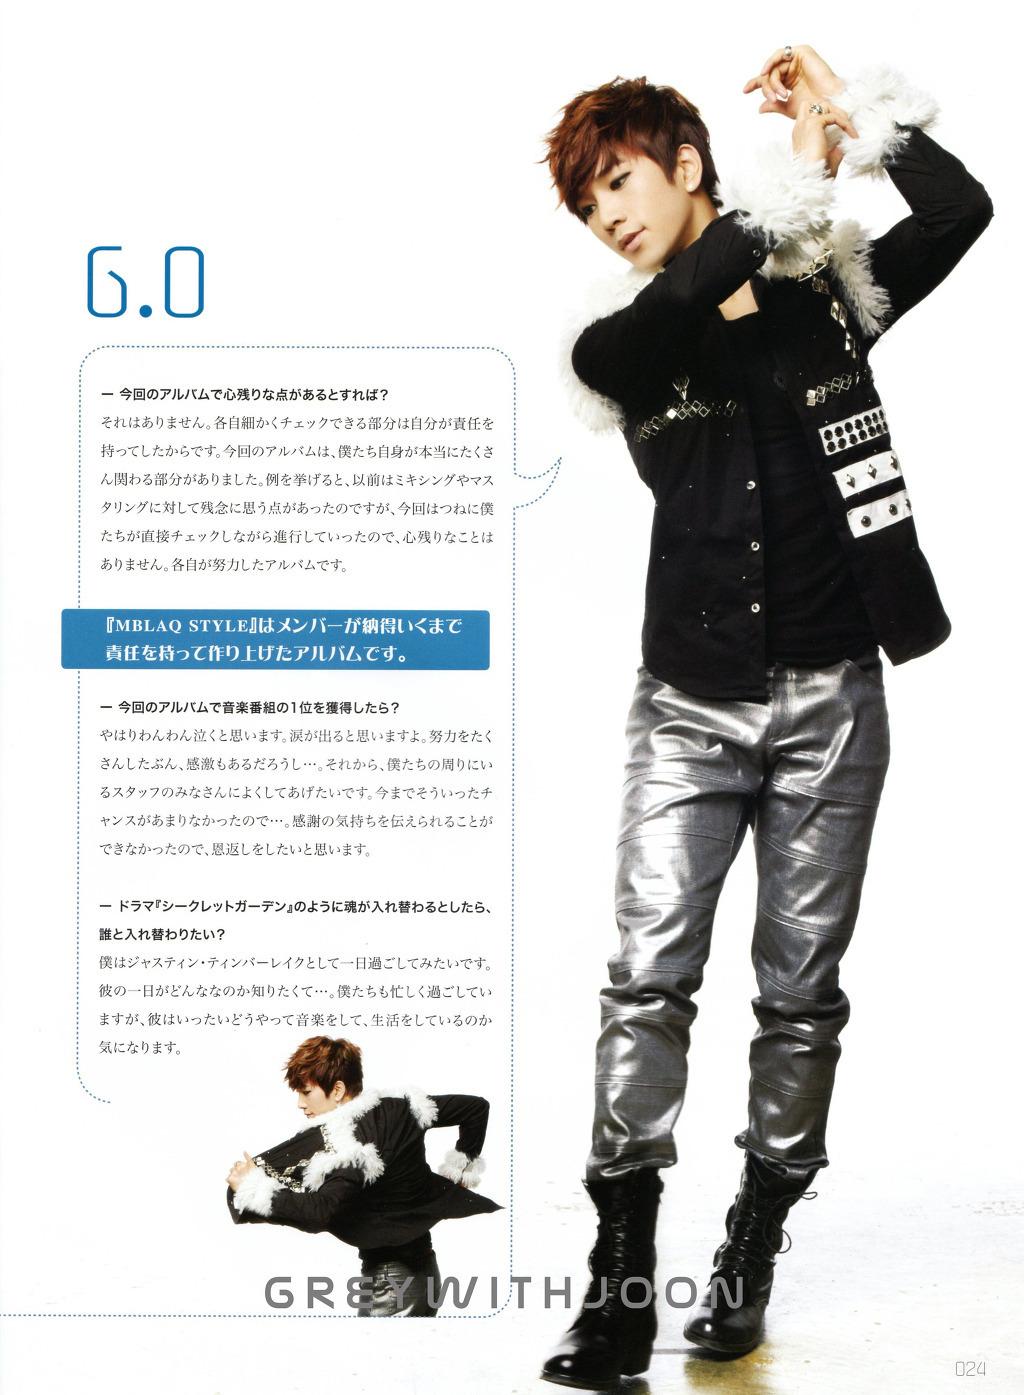 [01.03.11]MBLAQ @ CREA STAR Scan3